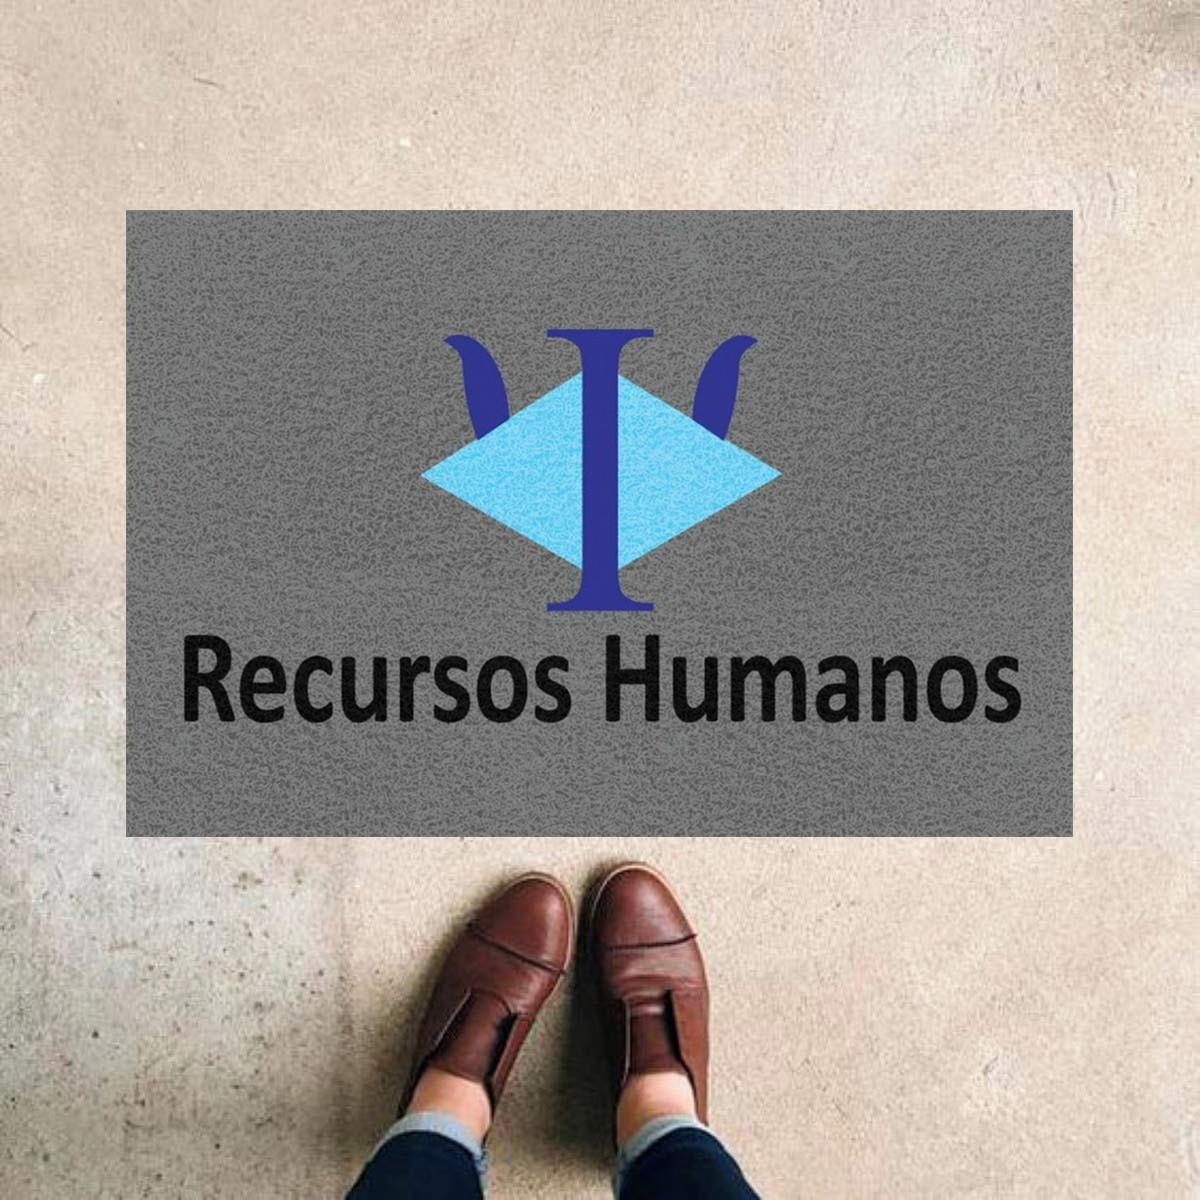 TAPETE CAPACHO RECURSOS HUMANOS